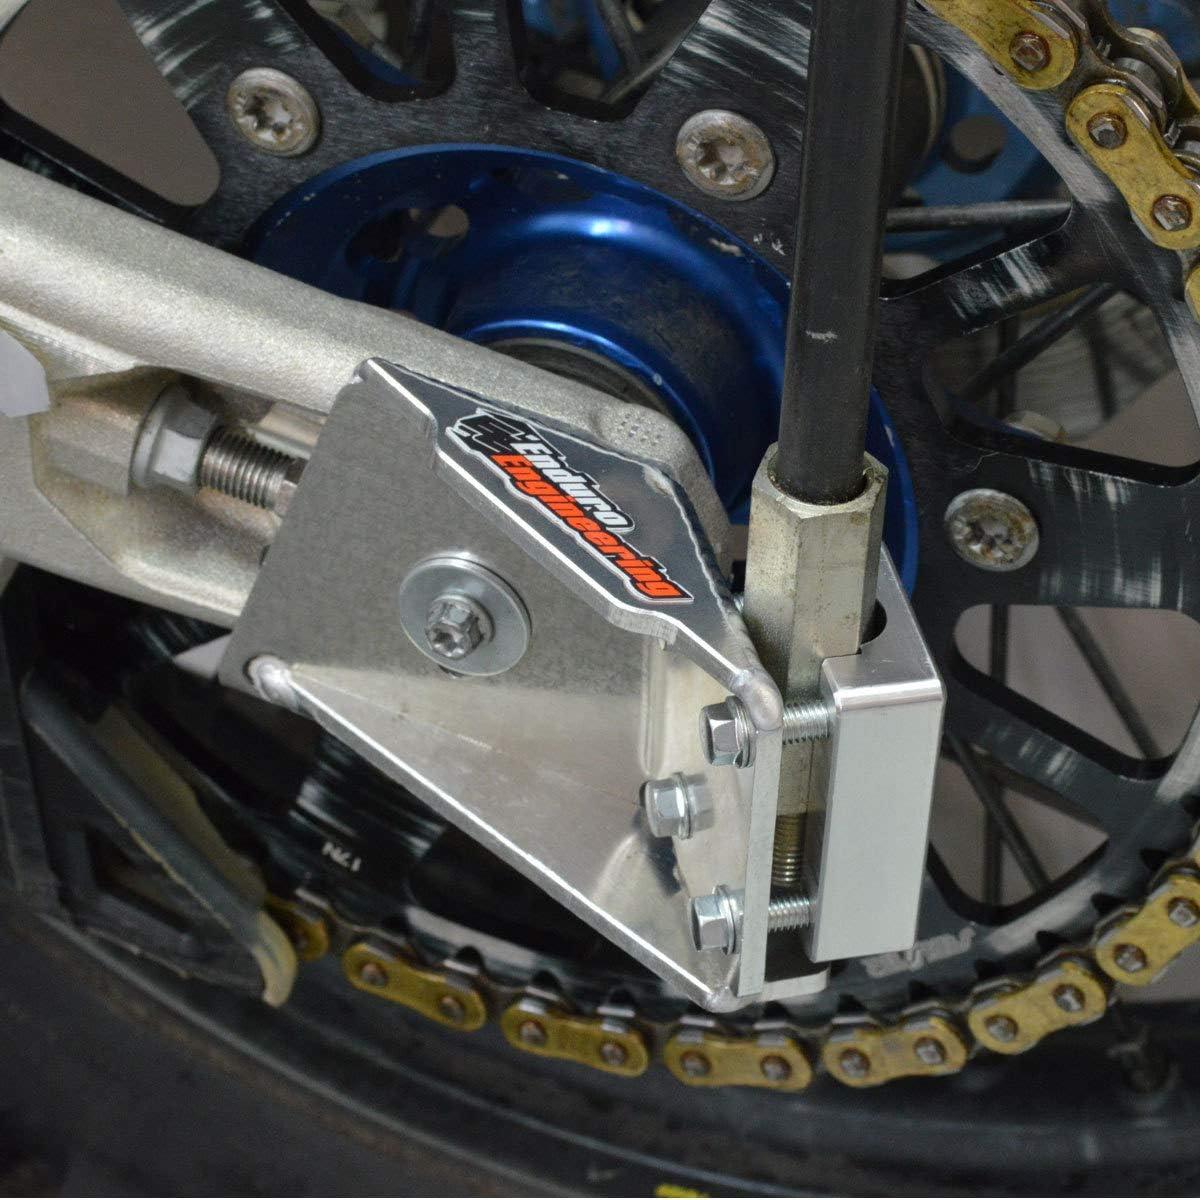 Safety Flag Whip Rear Axle Mounting Bracket Motorcycle Dirt Bike ATV Motocr...